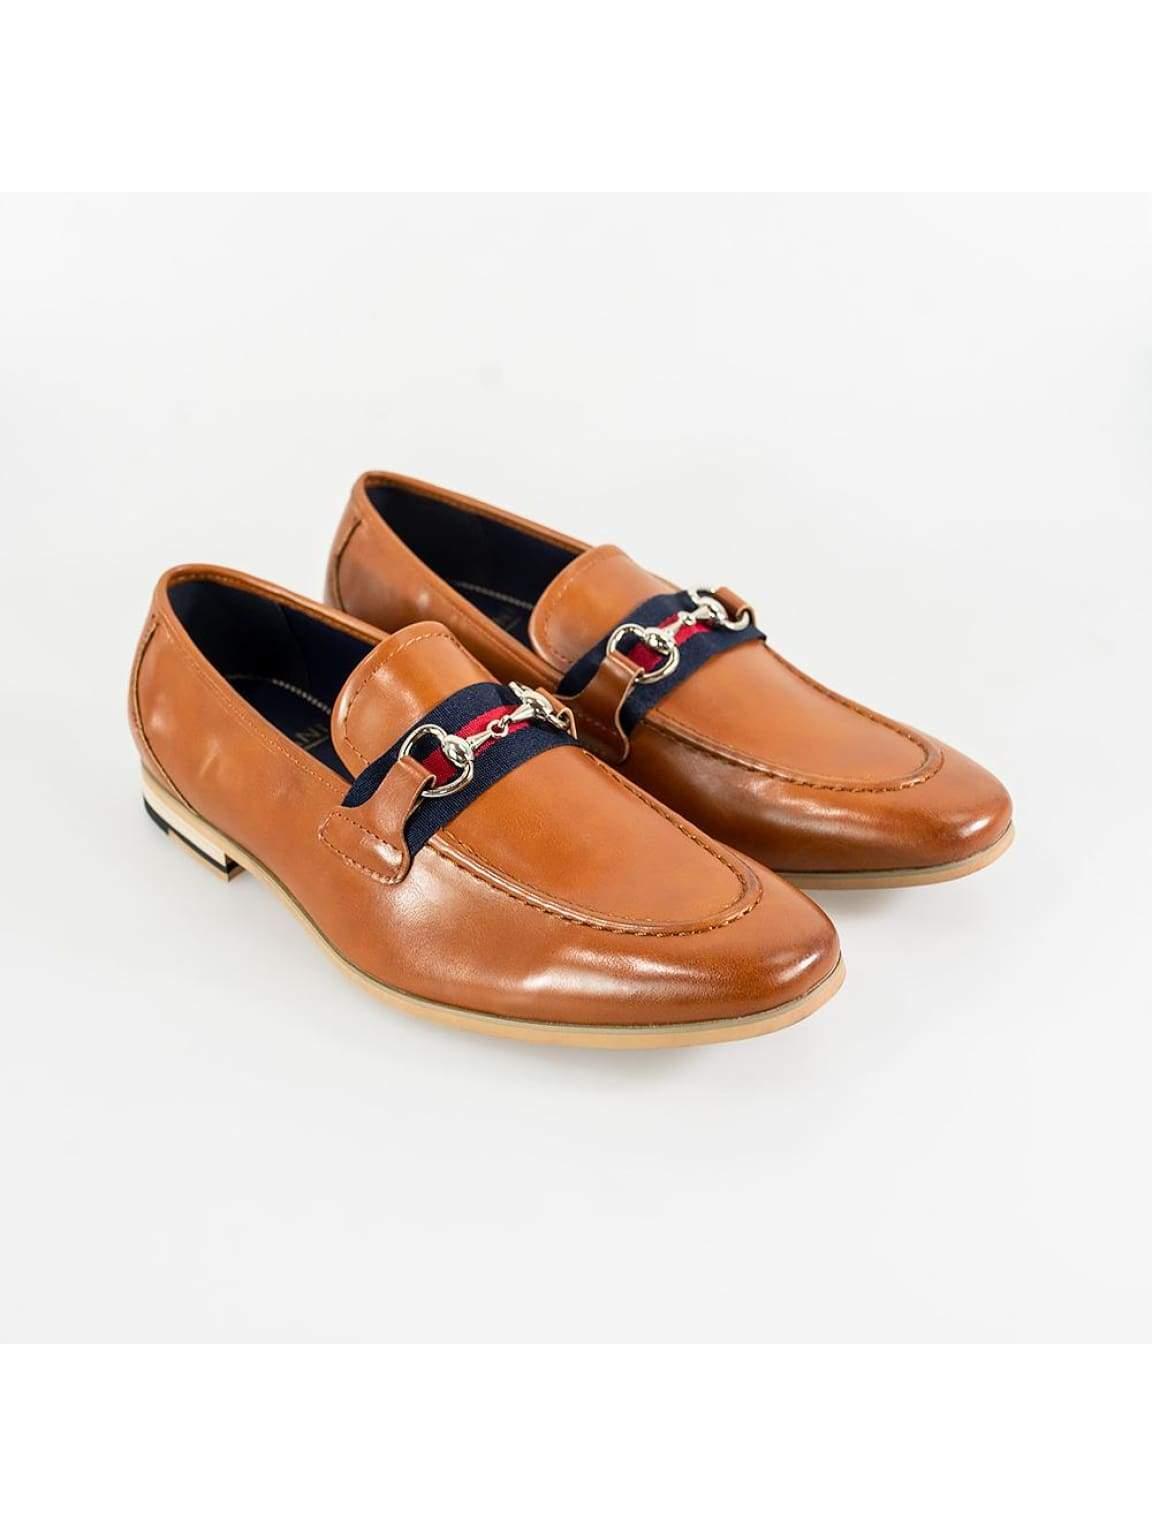 Cavani Yale Mens Tan Loafer - UK7 | EU41 - Shoes